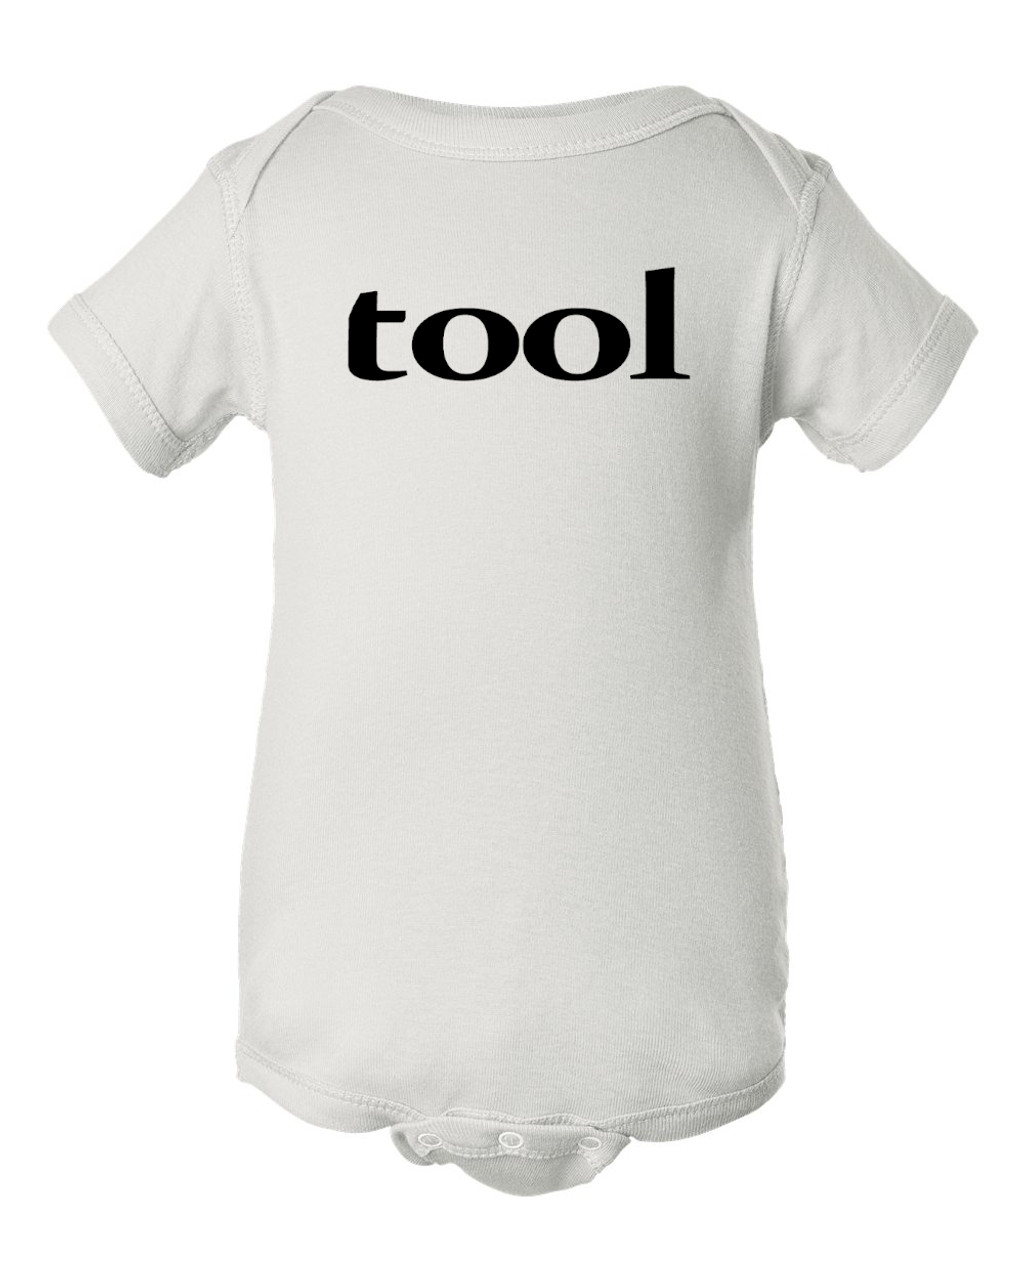 Original Design White Tool Baby Infant Tribute Concert Bodysuit